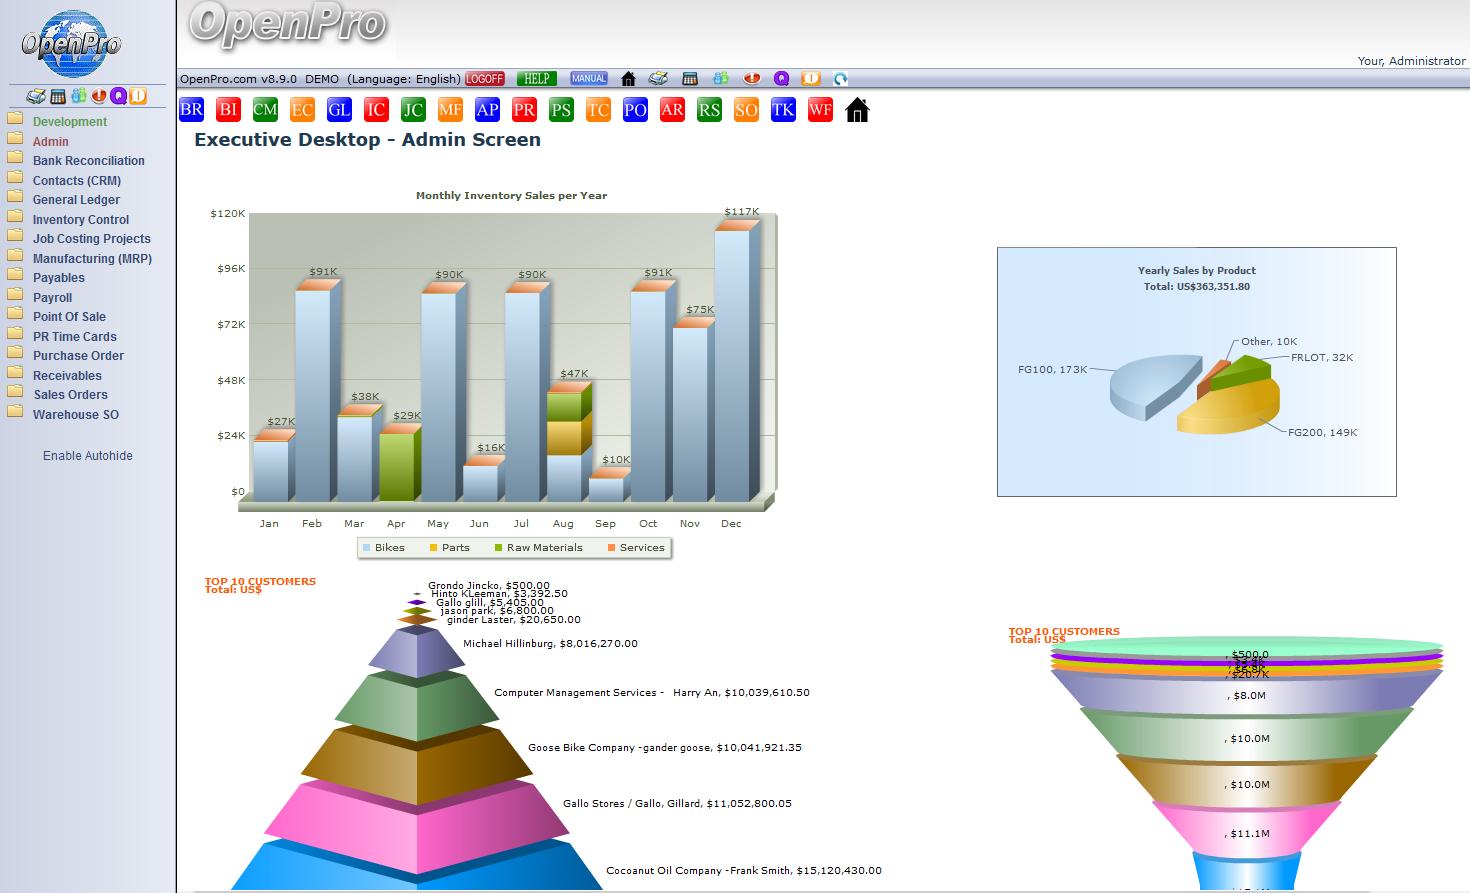 OpenPro Easy ERP Demo - OpenPro Main Menu screen